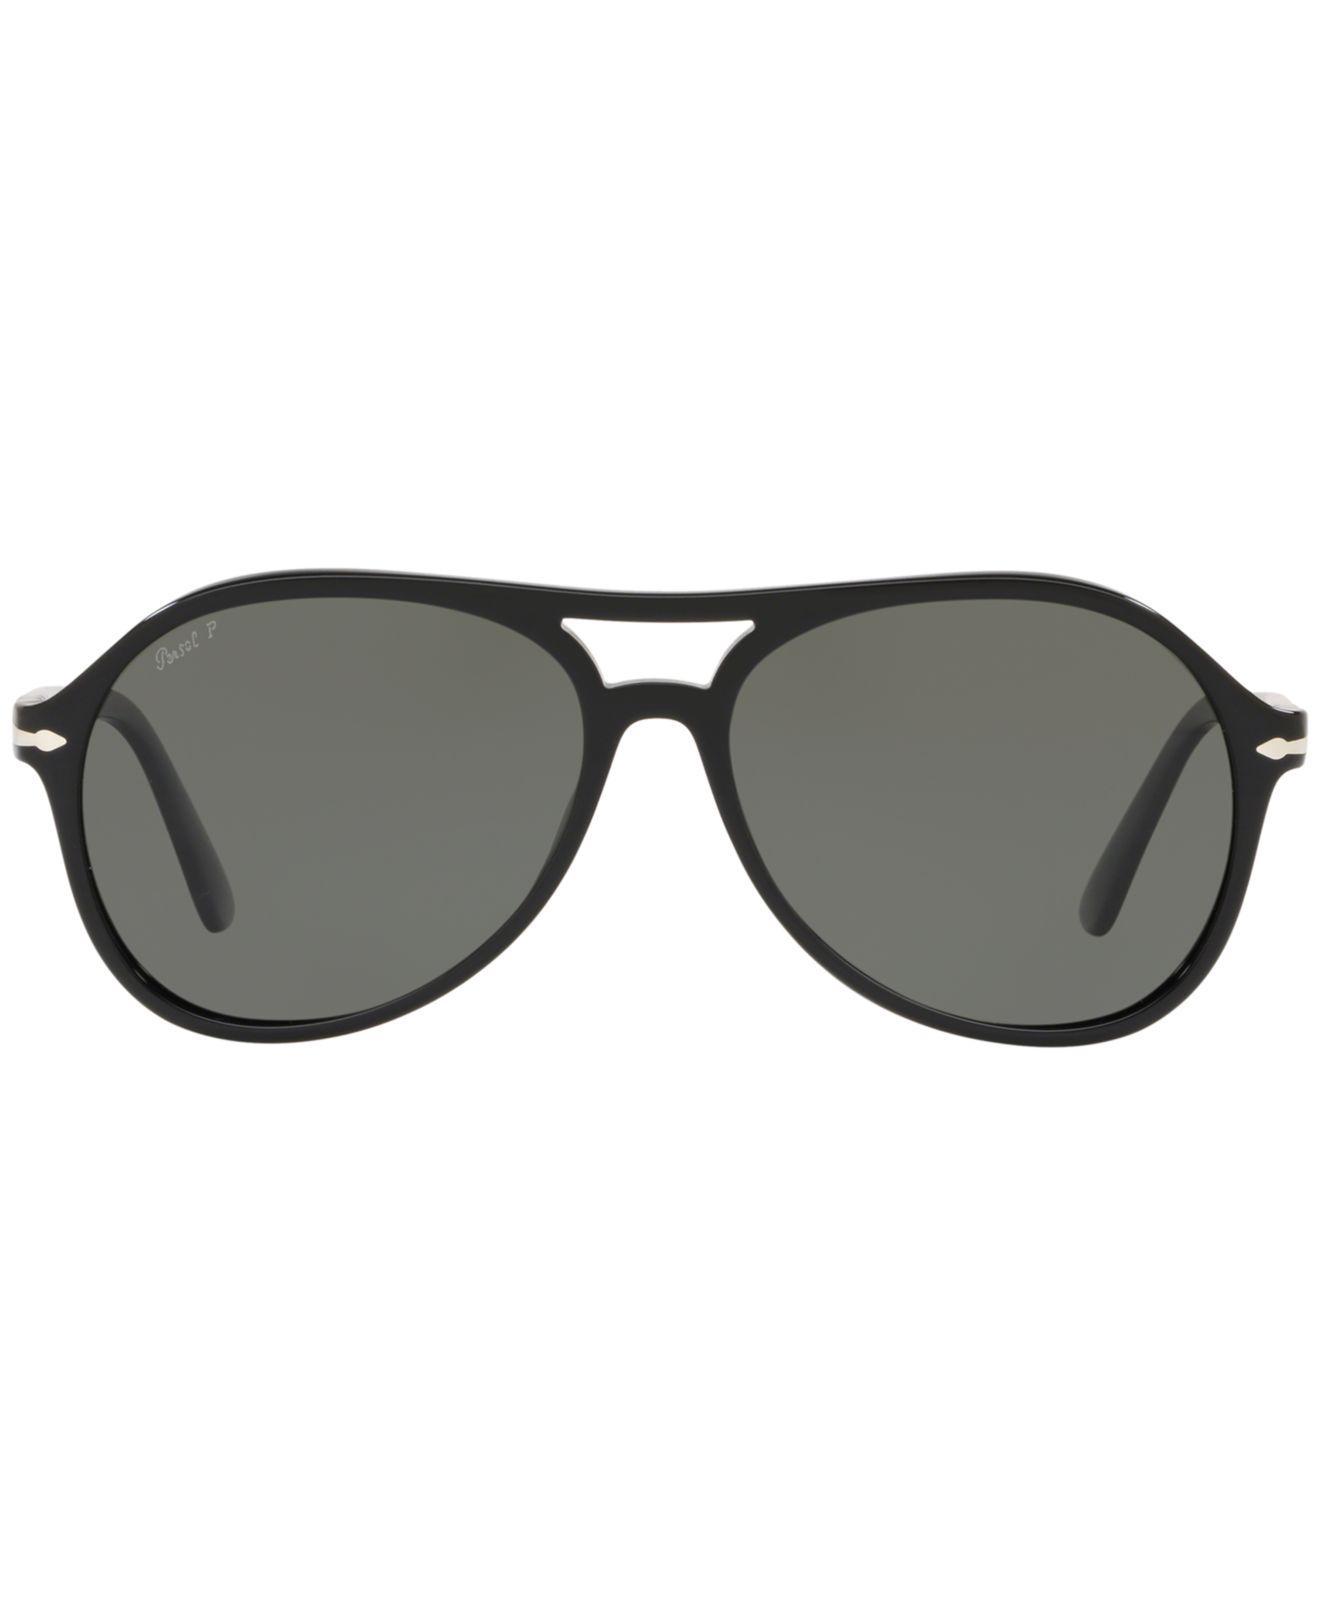 8476bb50f0 Lyst - Persol Polarized Sunglasses